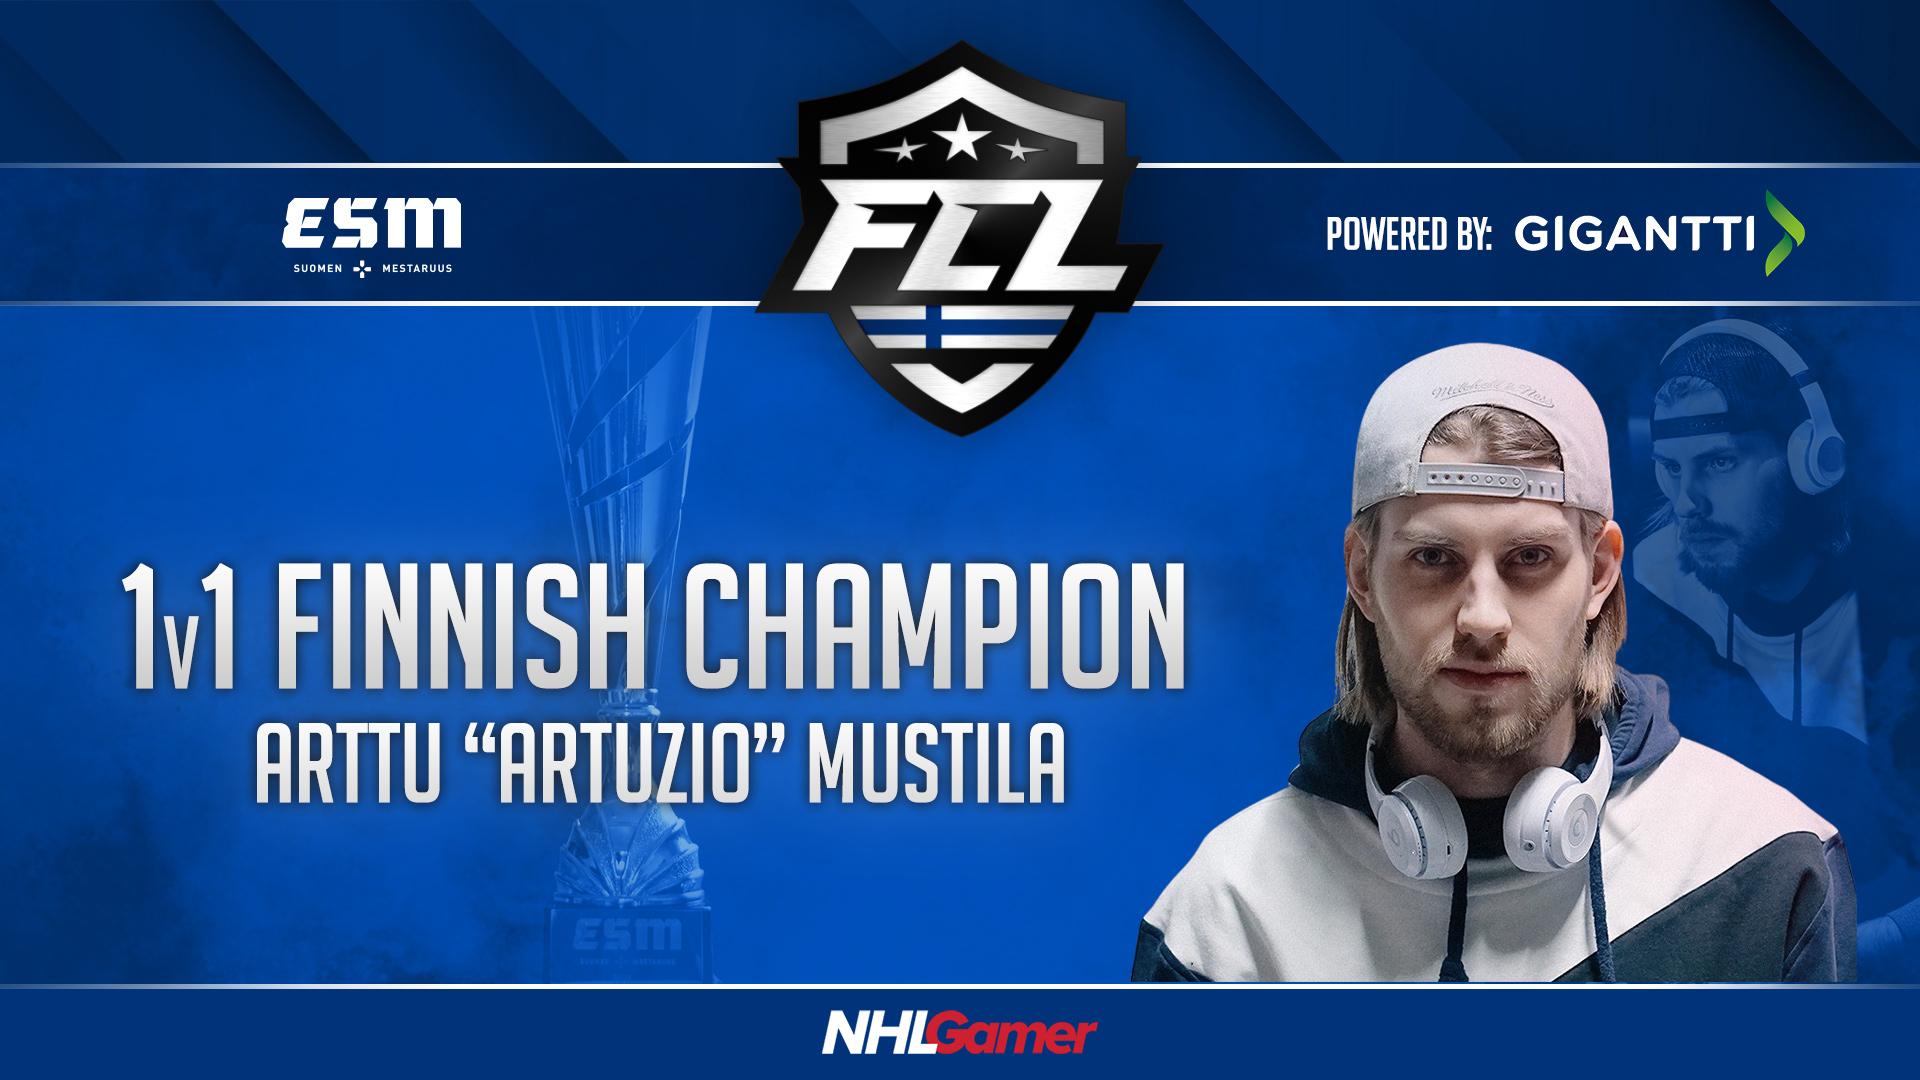 FCL_1v1_Champion_2020_Artuzio.jpg